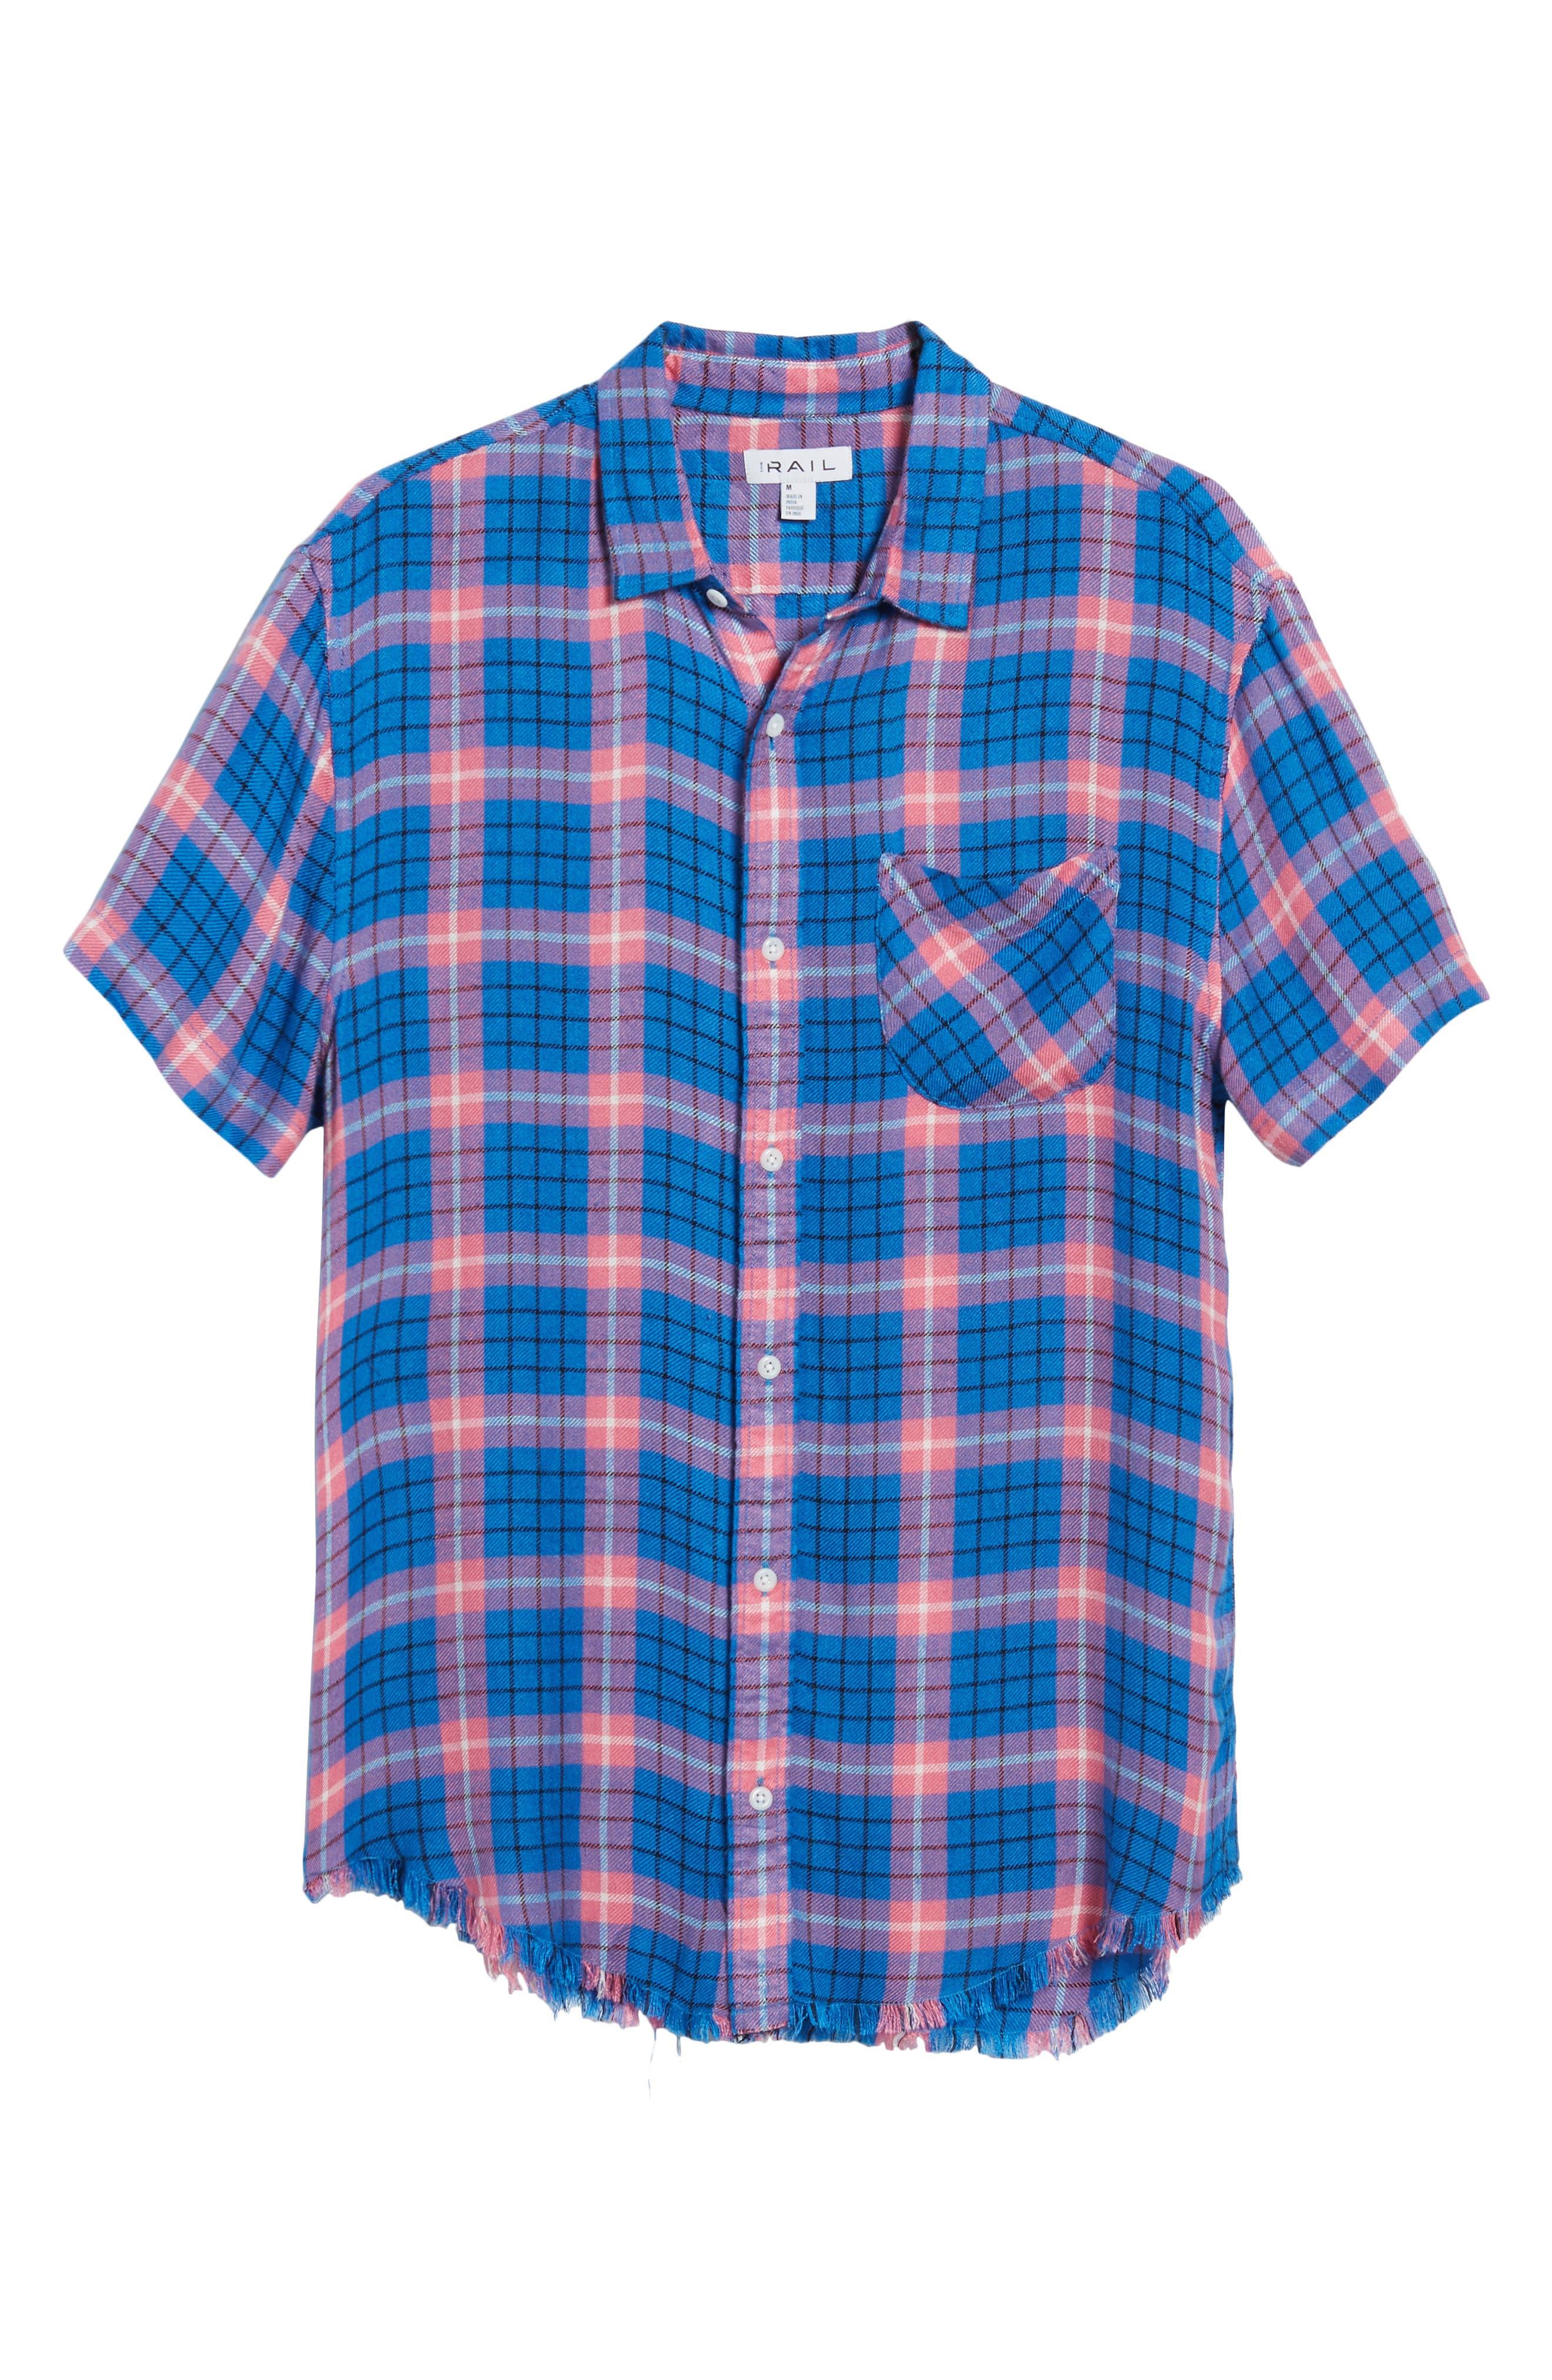 Flannel Woven Shirt,                             Alternate thumbnail 6, color,                             Blue Camp Pink Beck Plaid